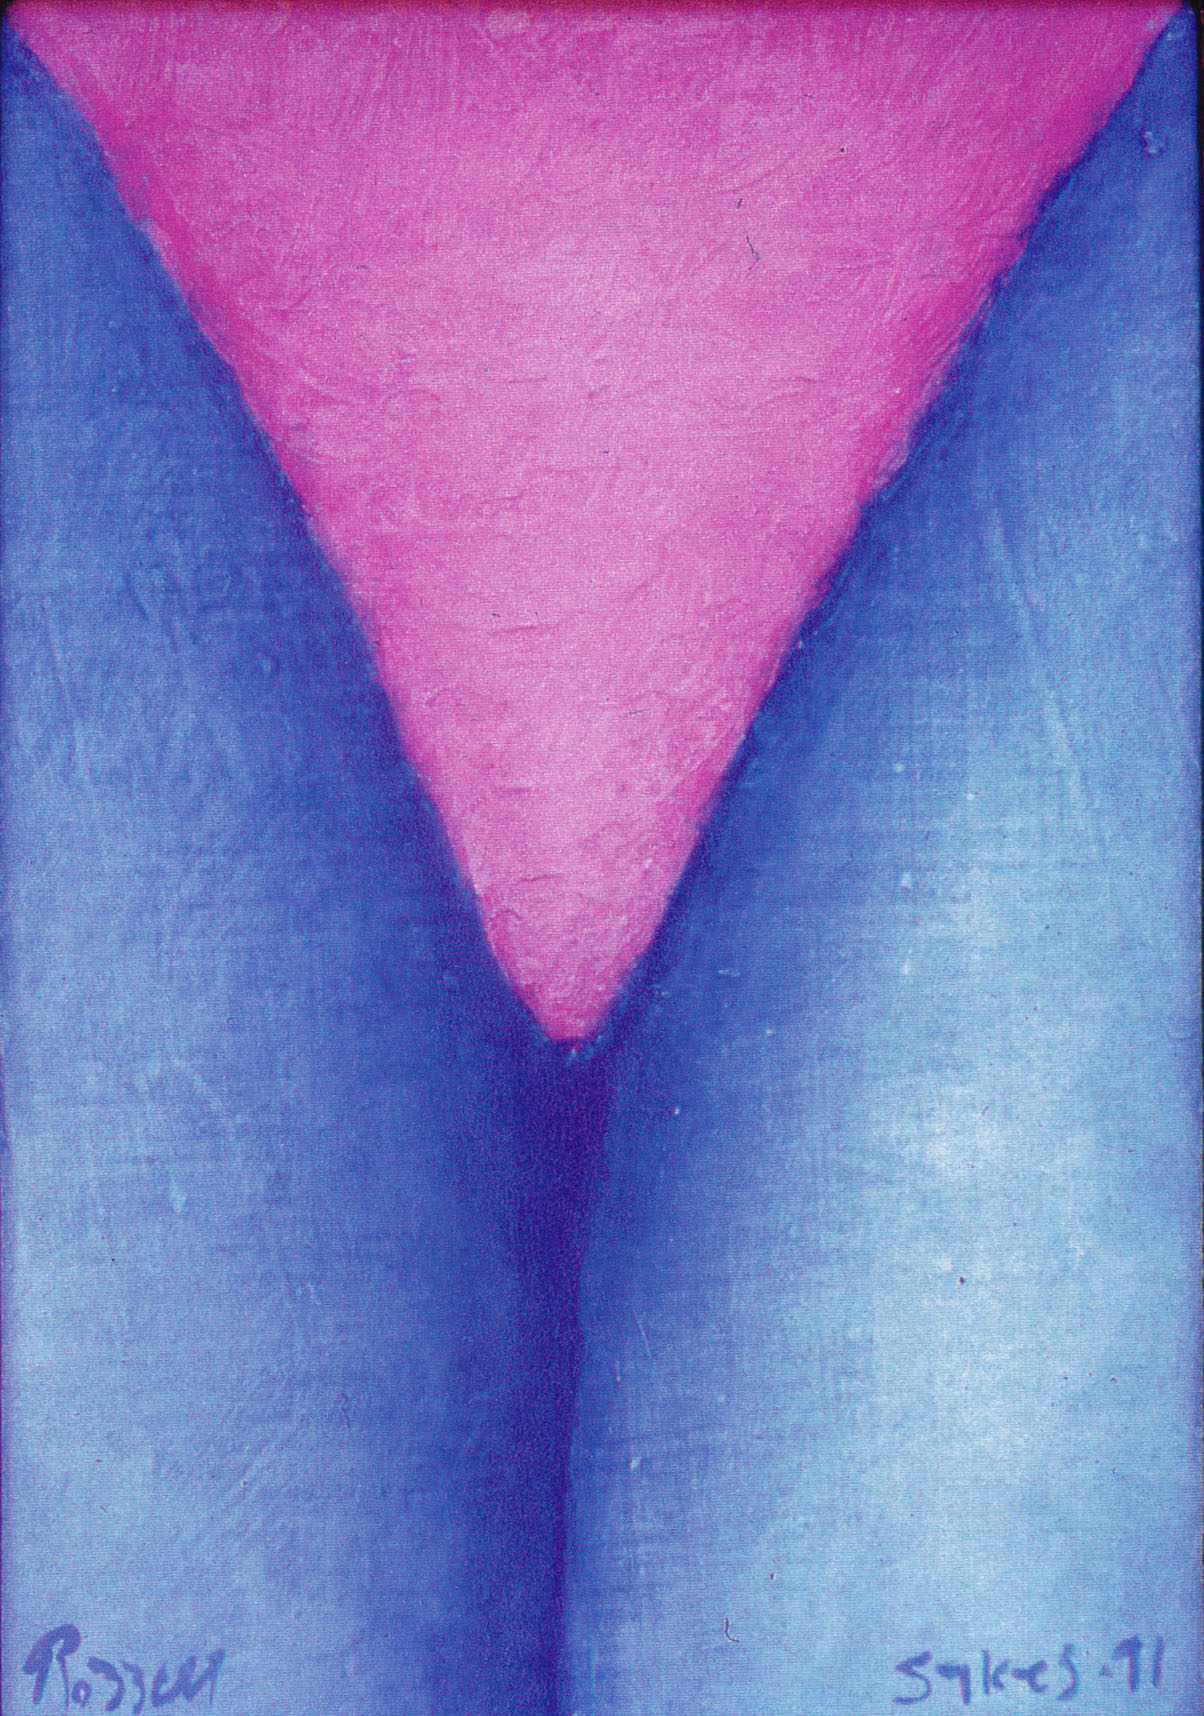 Crotch, 1991